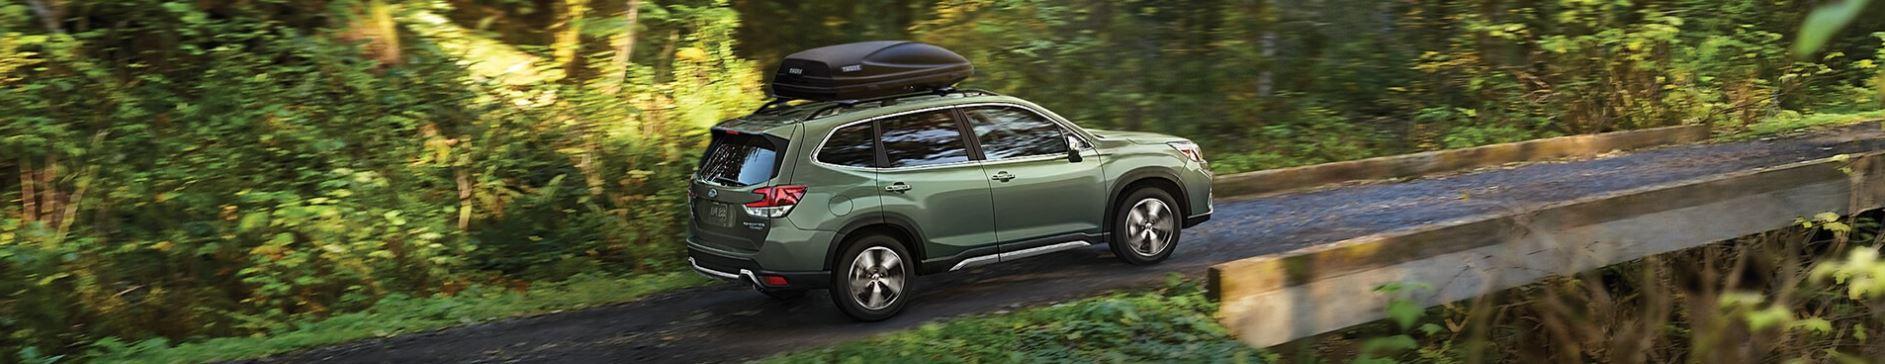 Subaru Forester dny suv